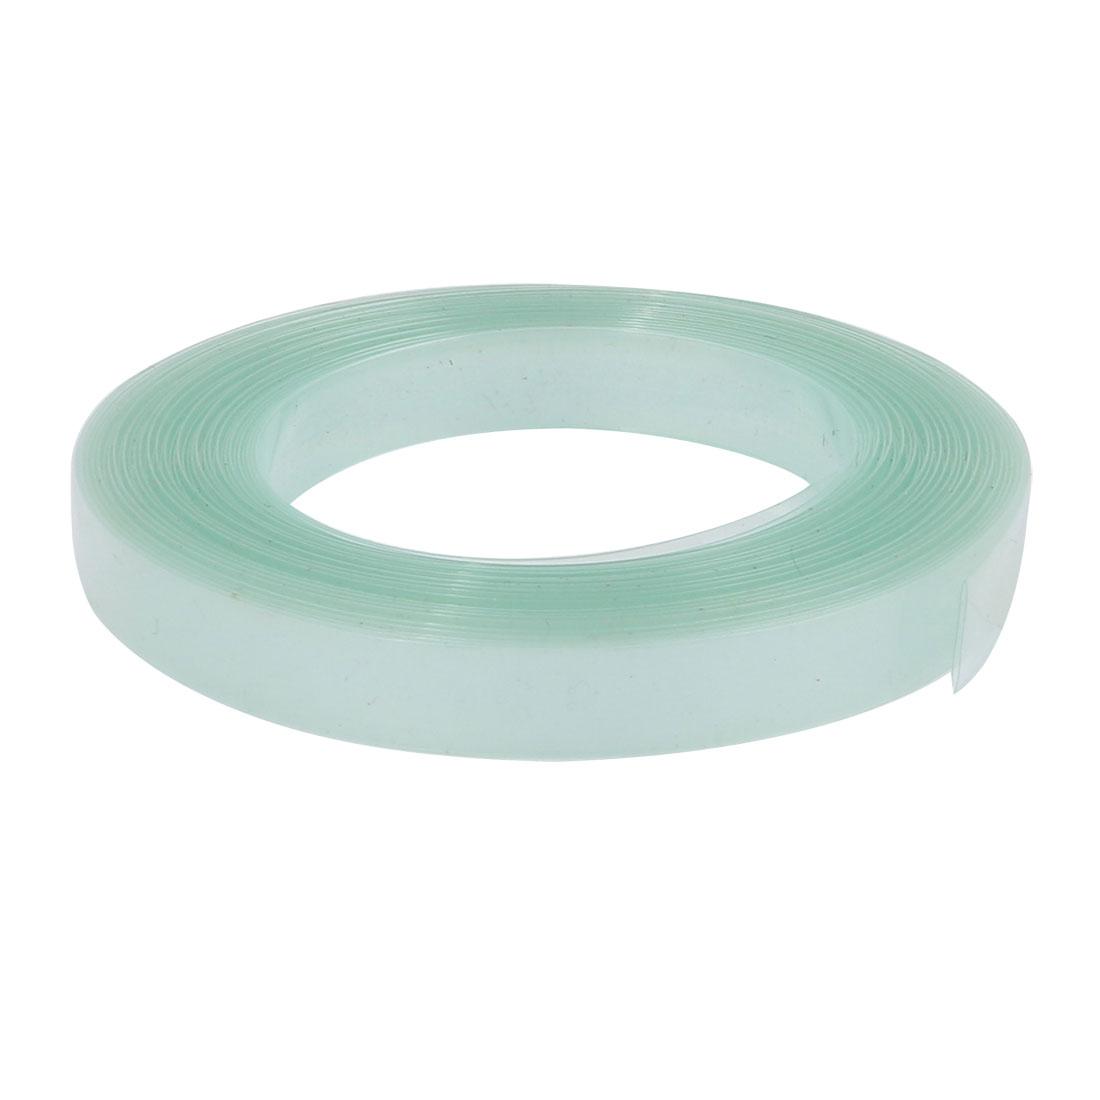 7mm Flat Width 6 Meters Long PVC Heat Shrinkable Tube Clear-green for Battery